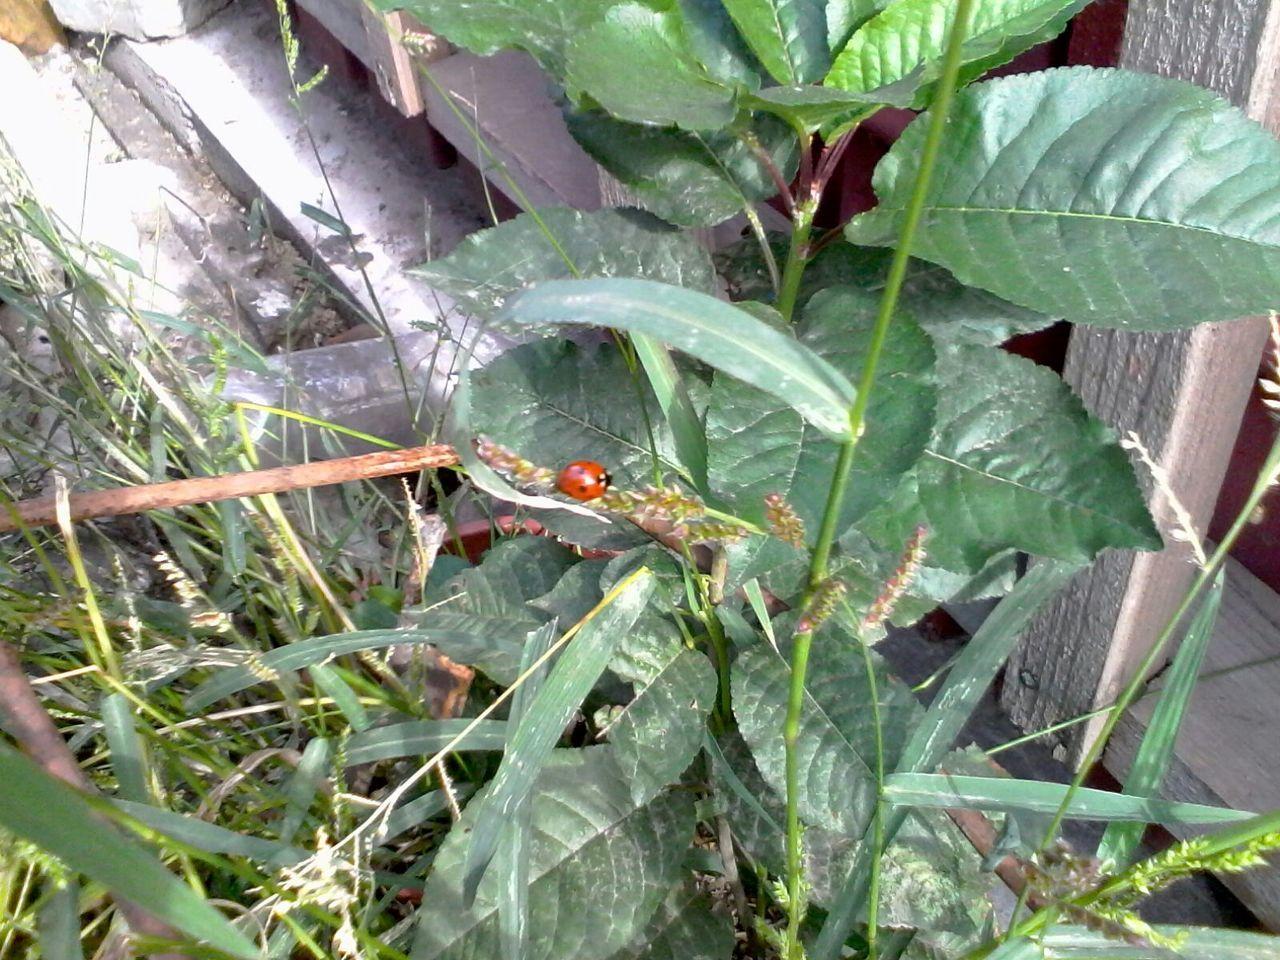 Green Leafs Ladybeetle Grass Plants Ladybug Unedited Wolfzuachis Eyeem Market